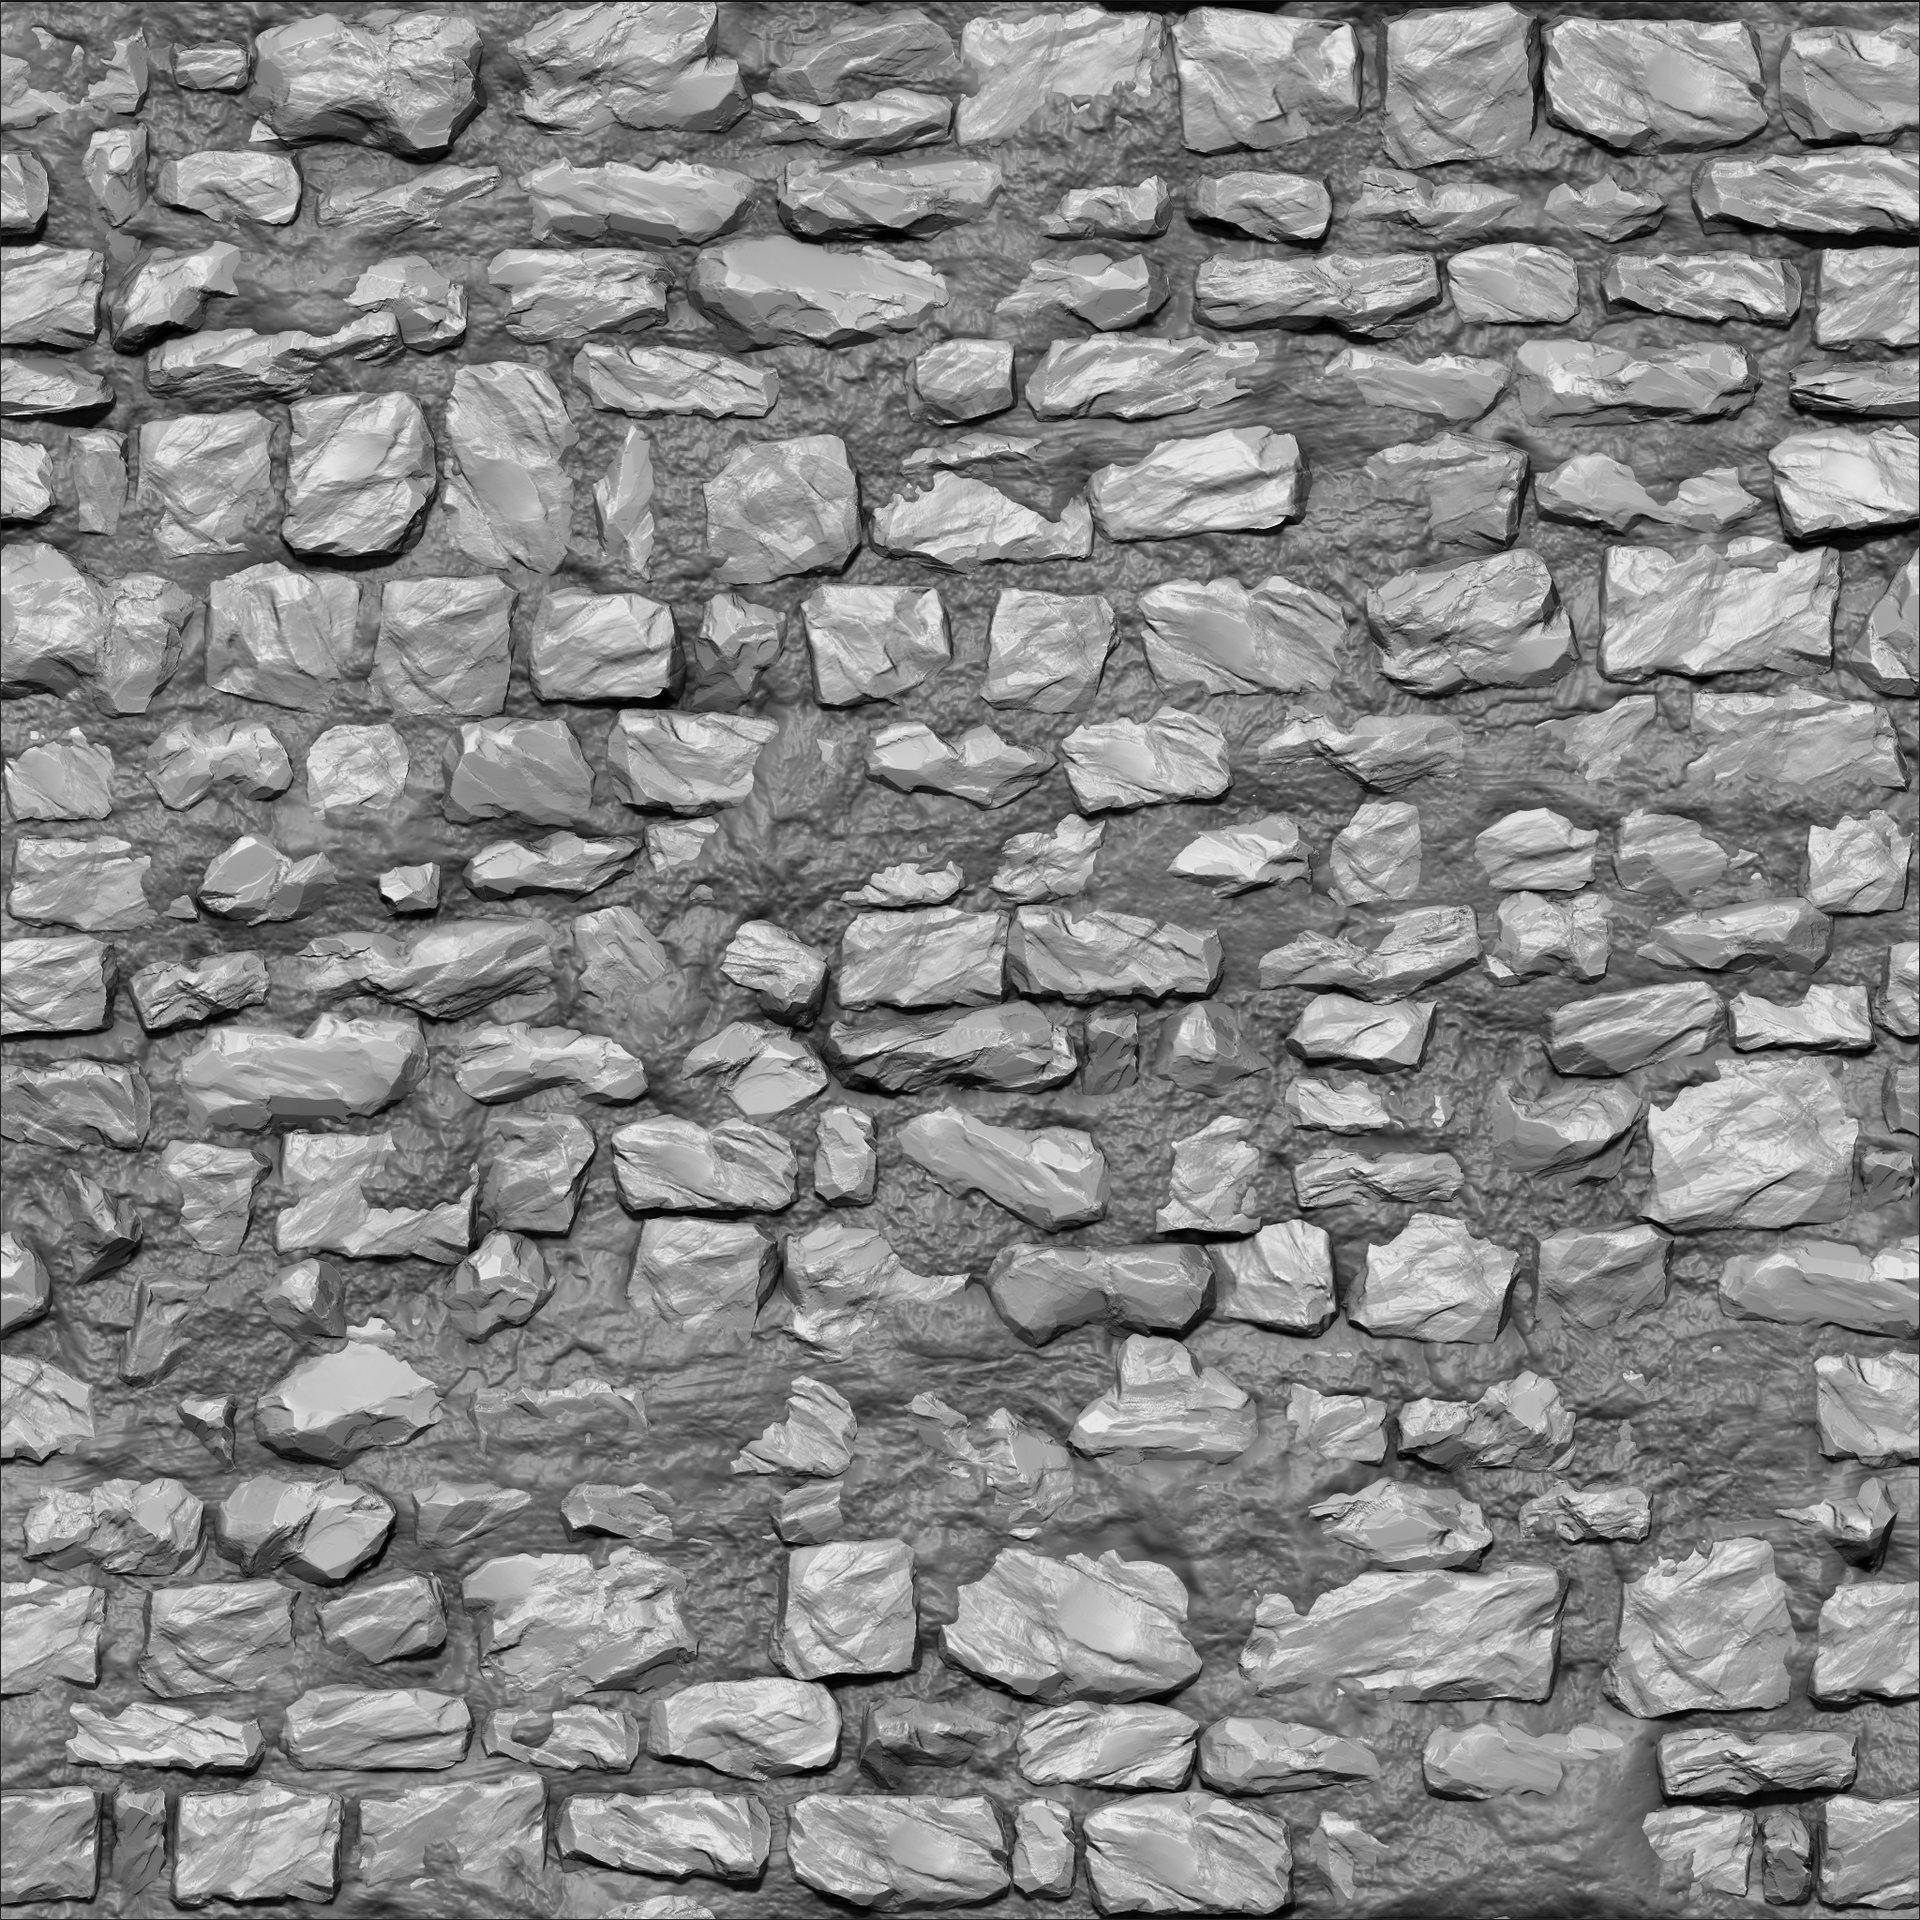 Joakim stigsson stone wall 01 hp